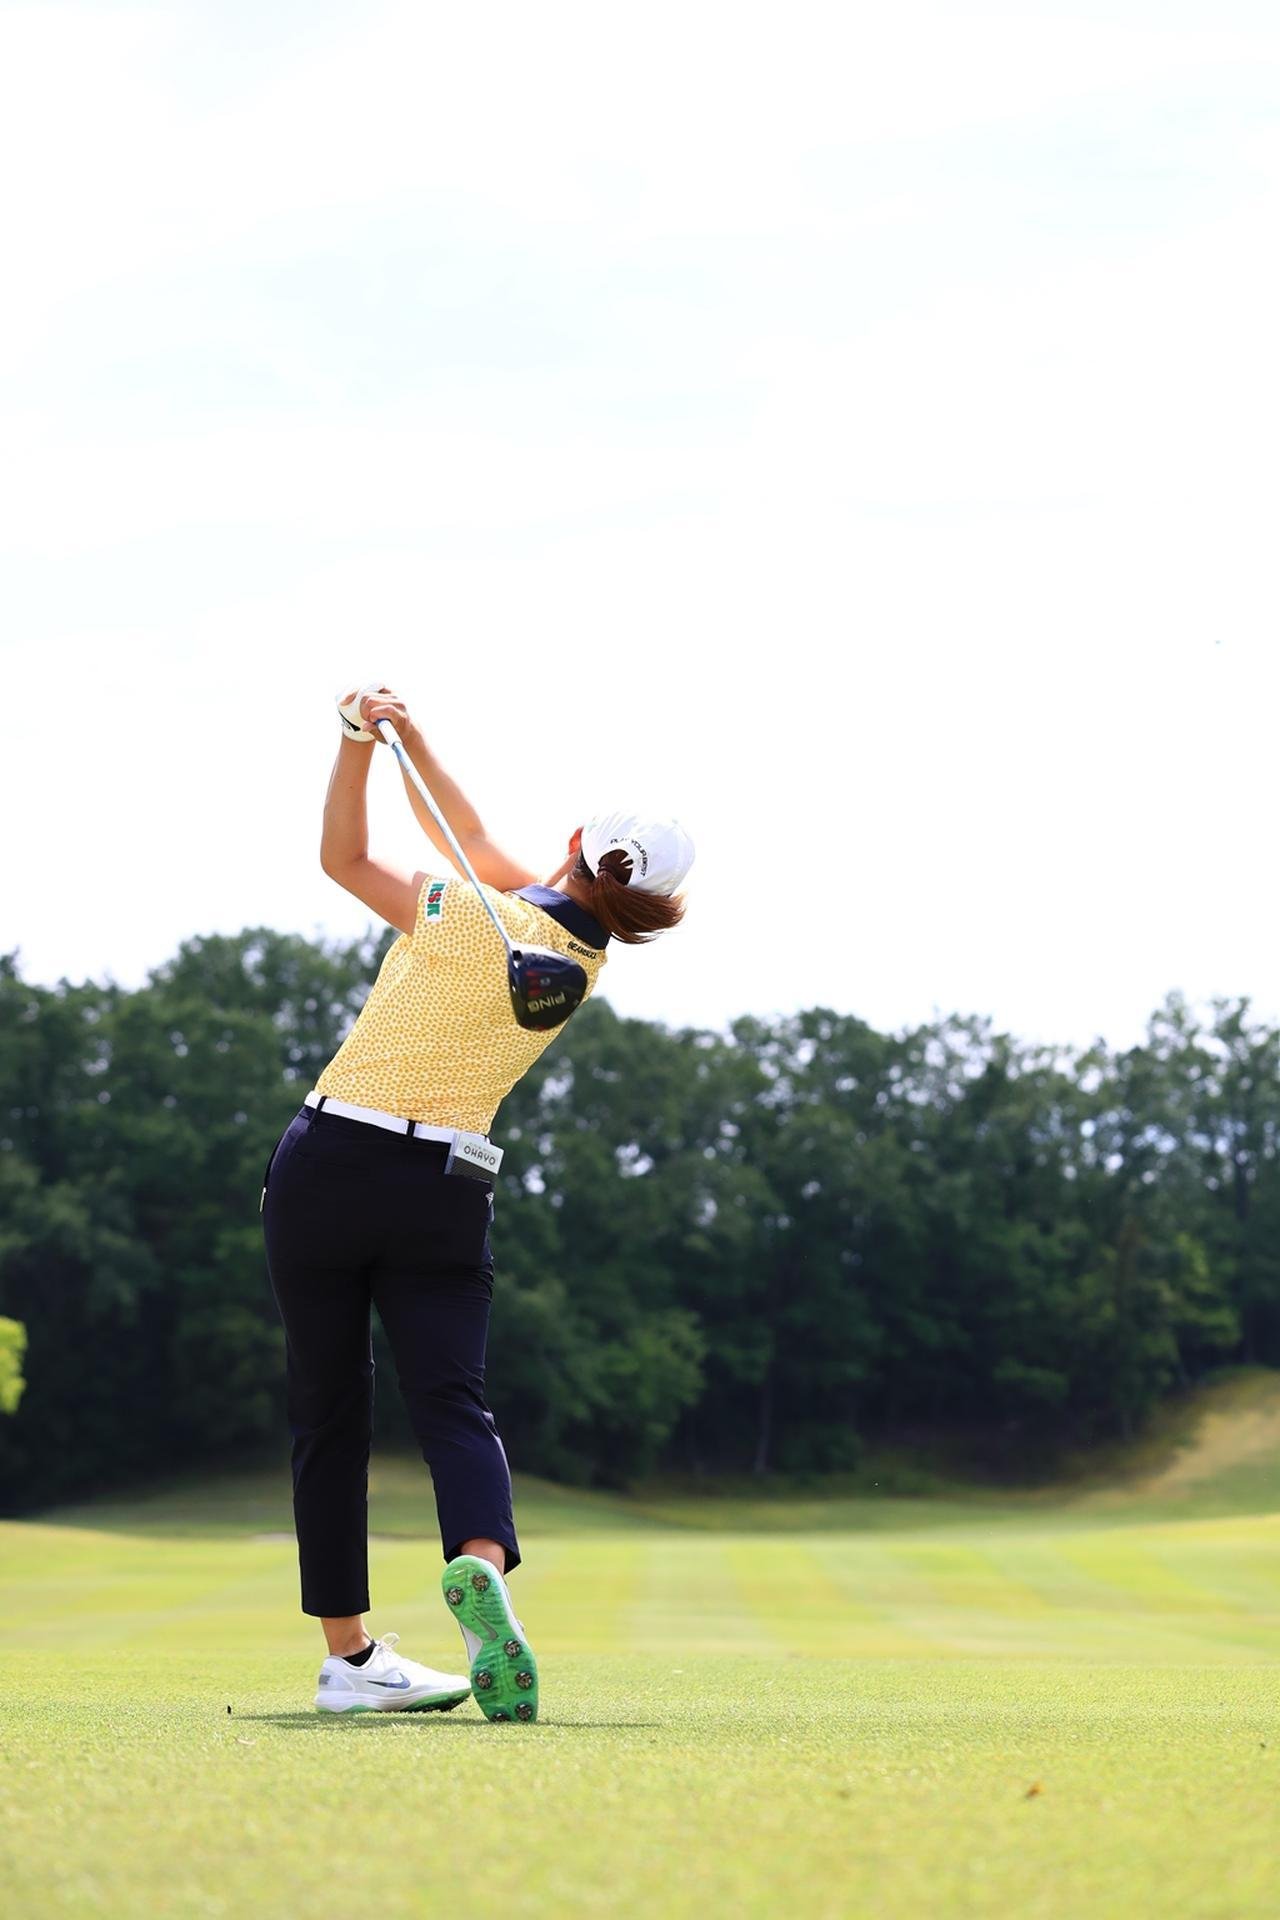 Images : 18番目の画像 - 渋野日向子のドライバー後方連続写真 - みんなのゴルフダイジェスト